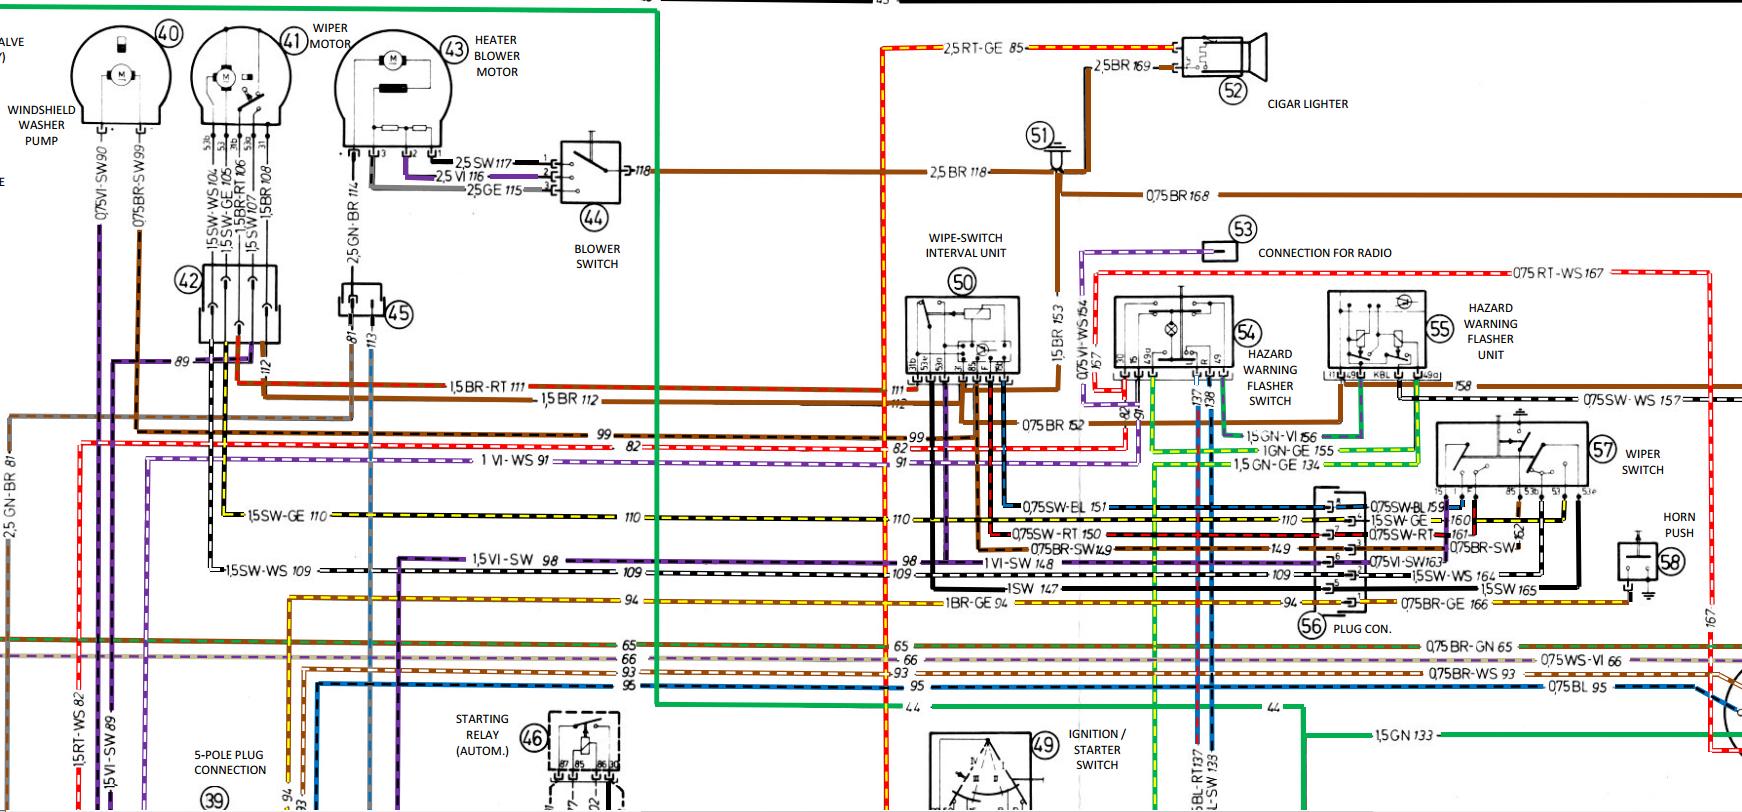 bmw e23 wiring diagram bmw 745i wiring diagram wiring diagram data  bmw 745i wiring diagram wiring